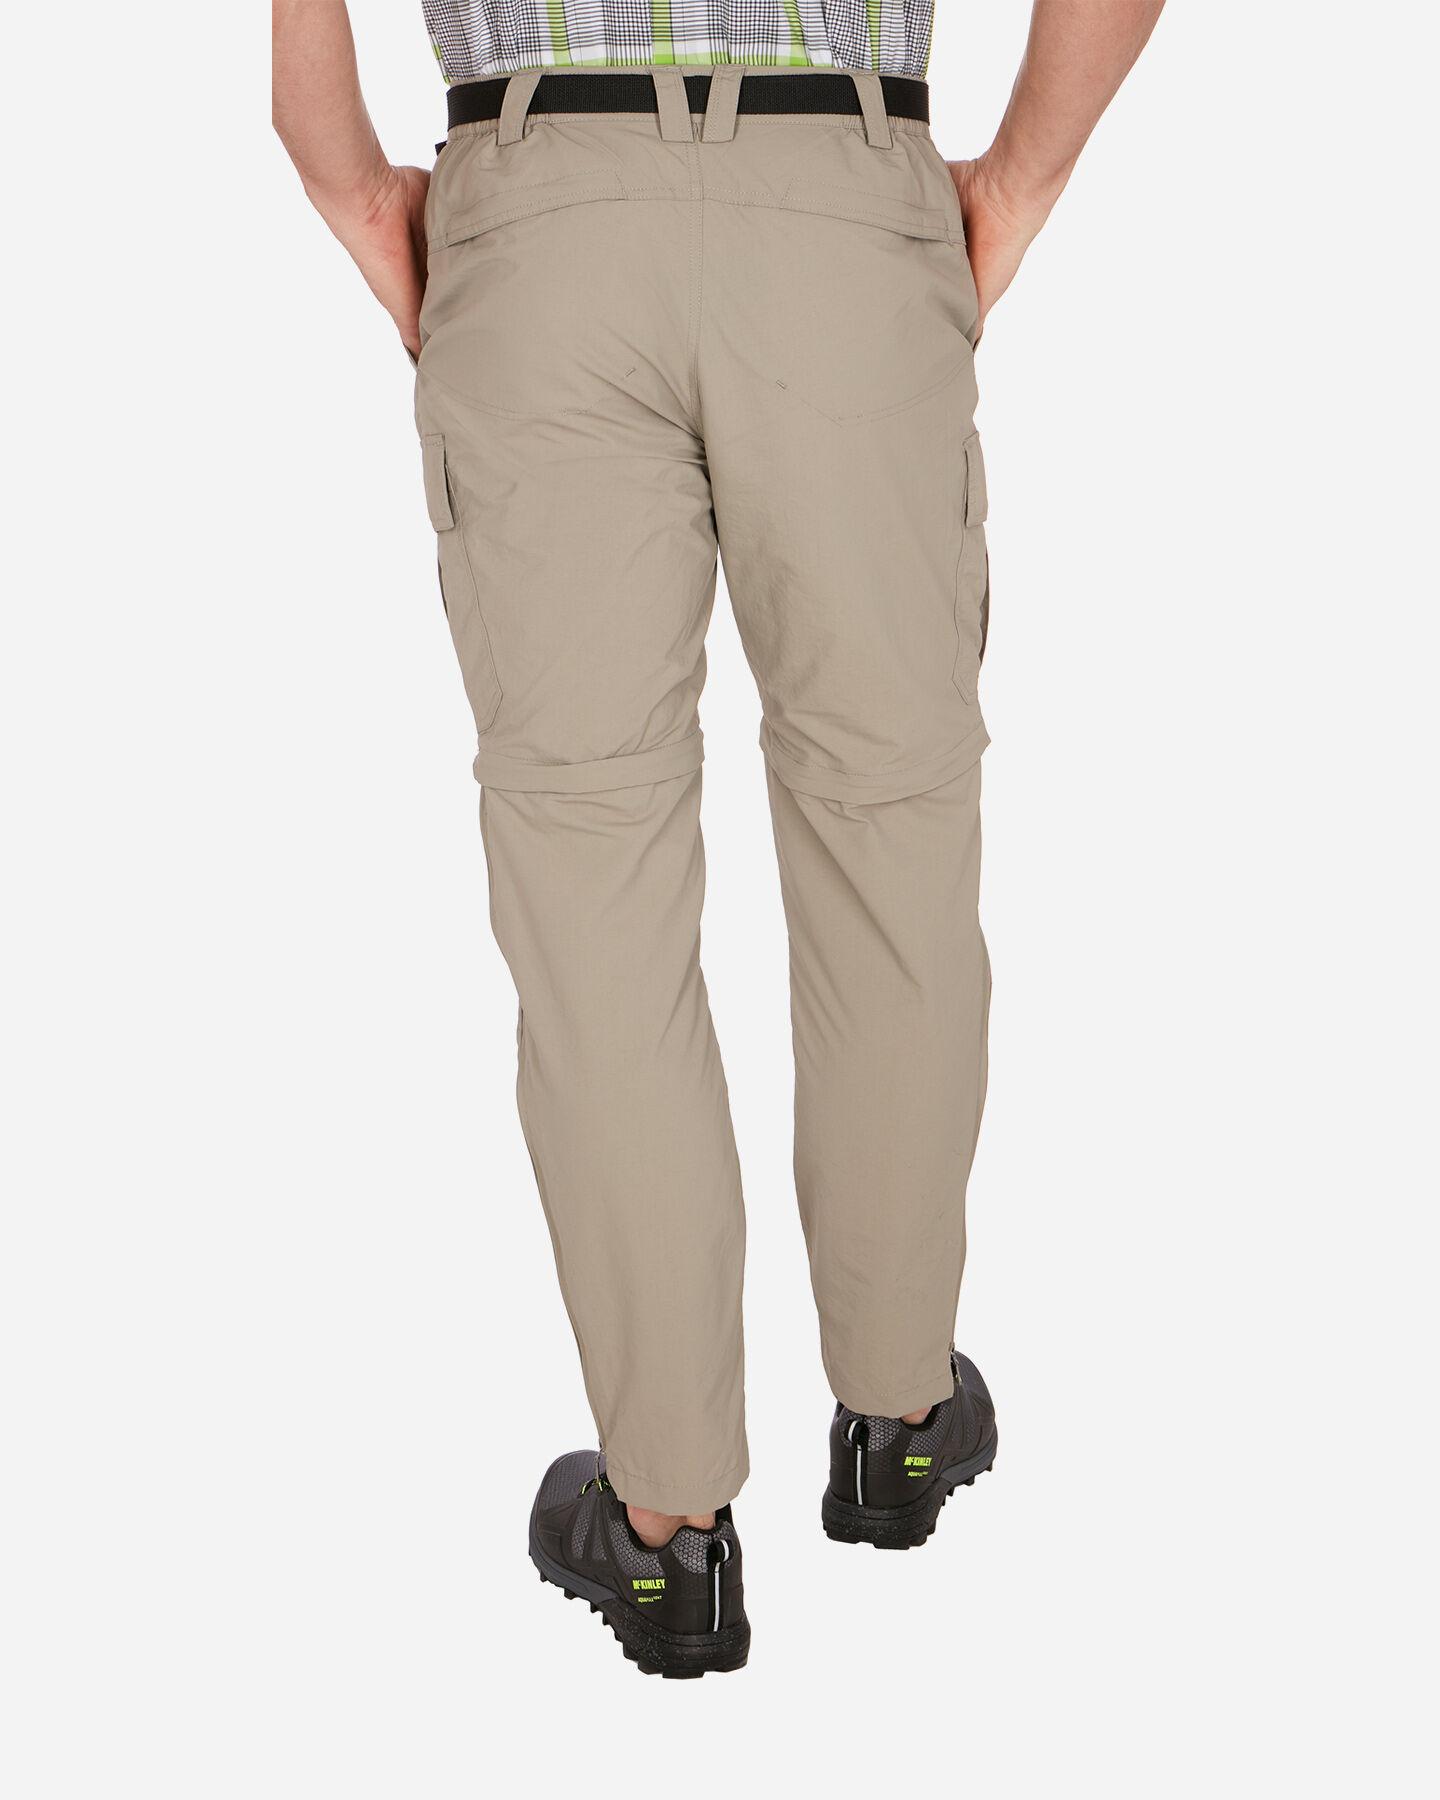 Pantalone outdoor MCKINLEY MAMITE GREY M S2004294 scatto 2